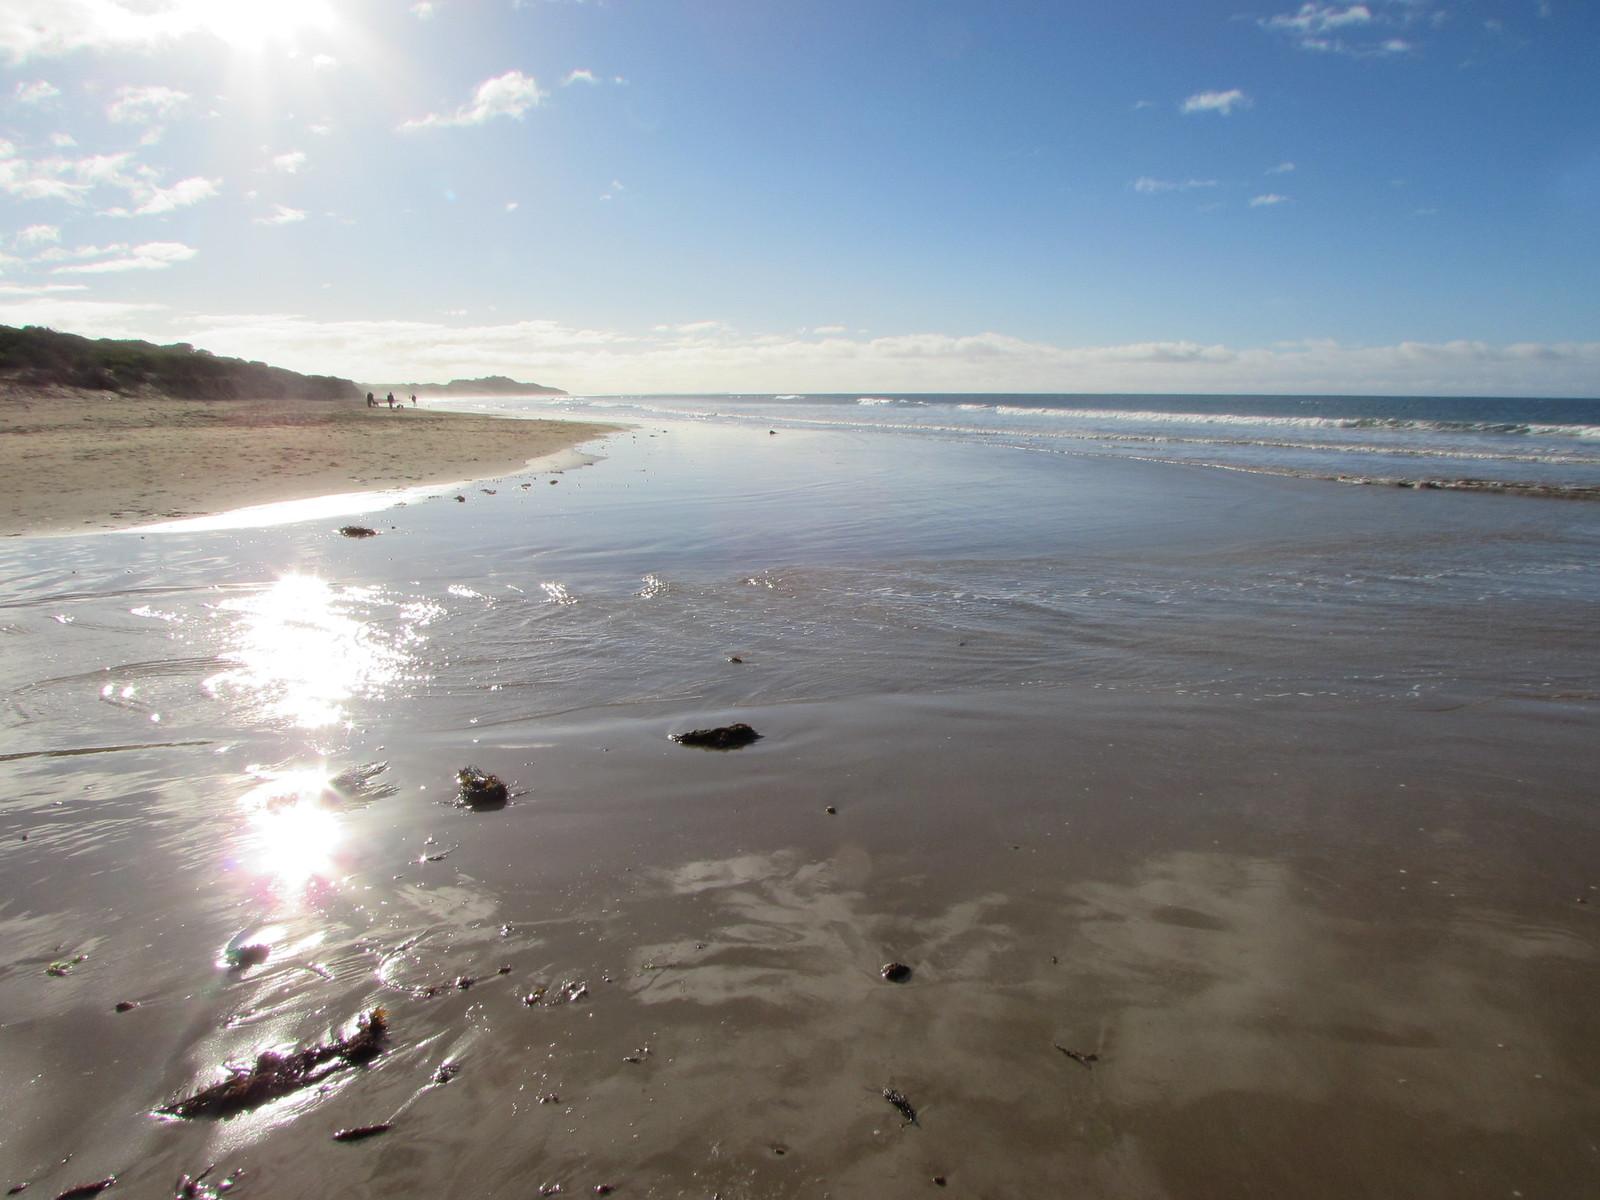 Beach near Torquay